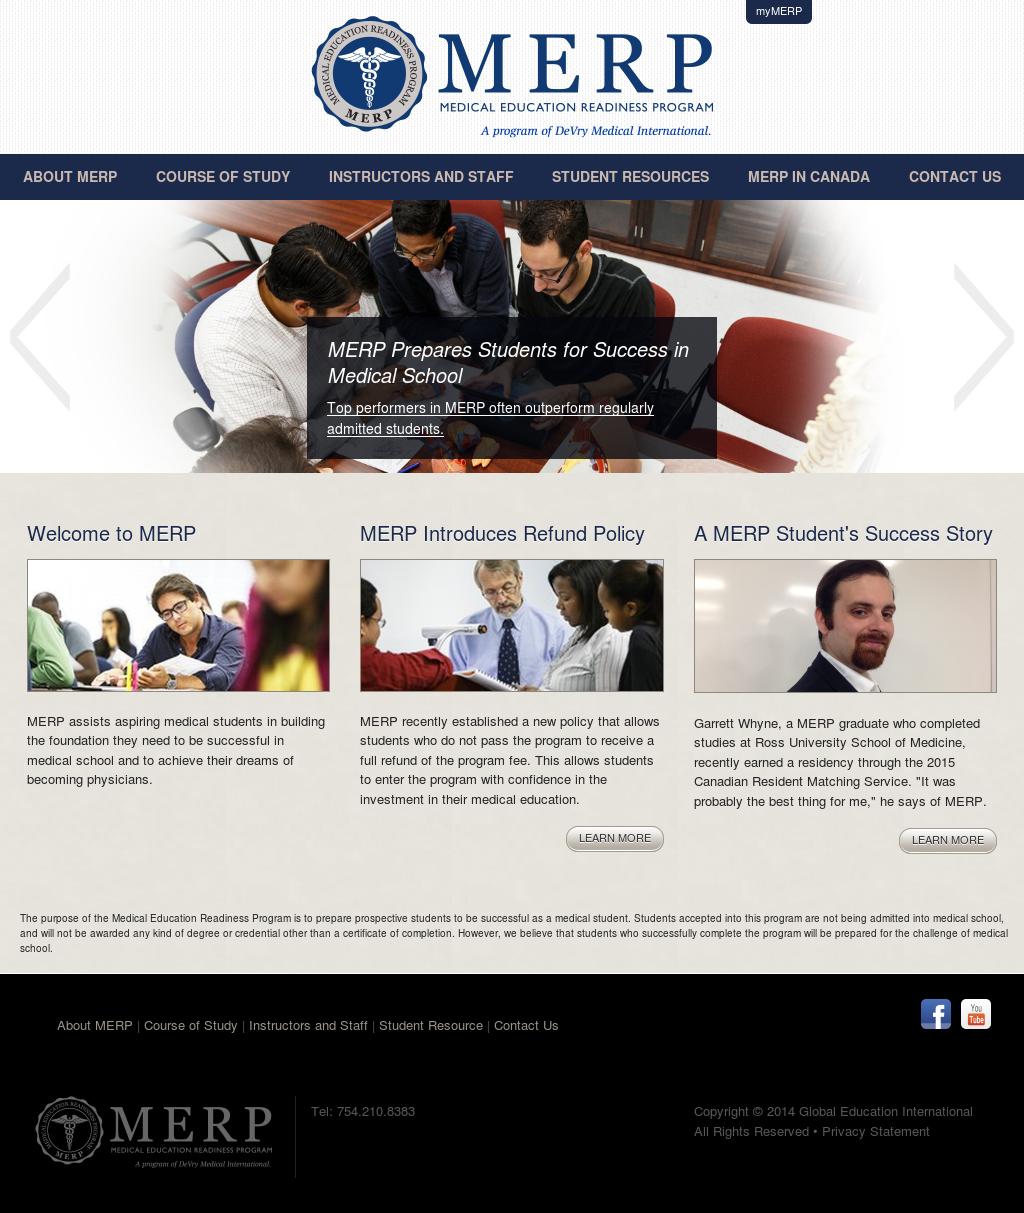 Medical Education Readiness Program